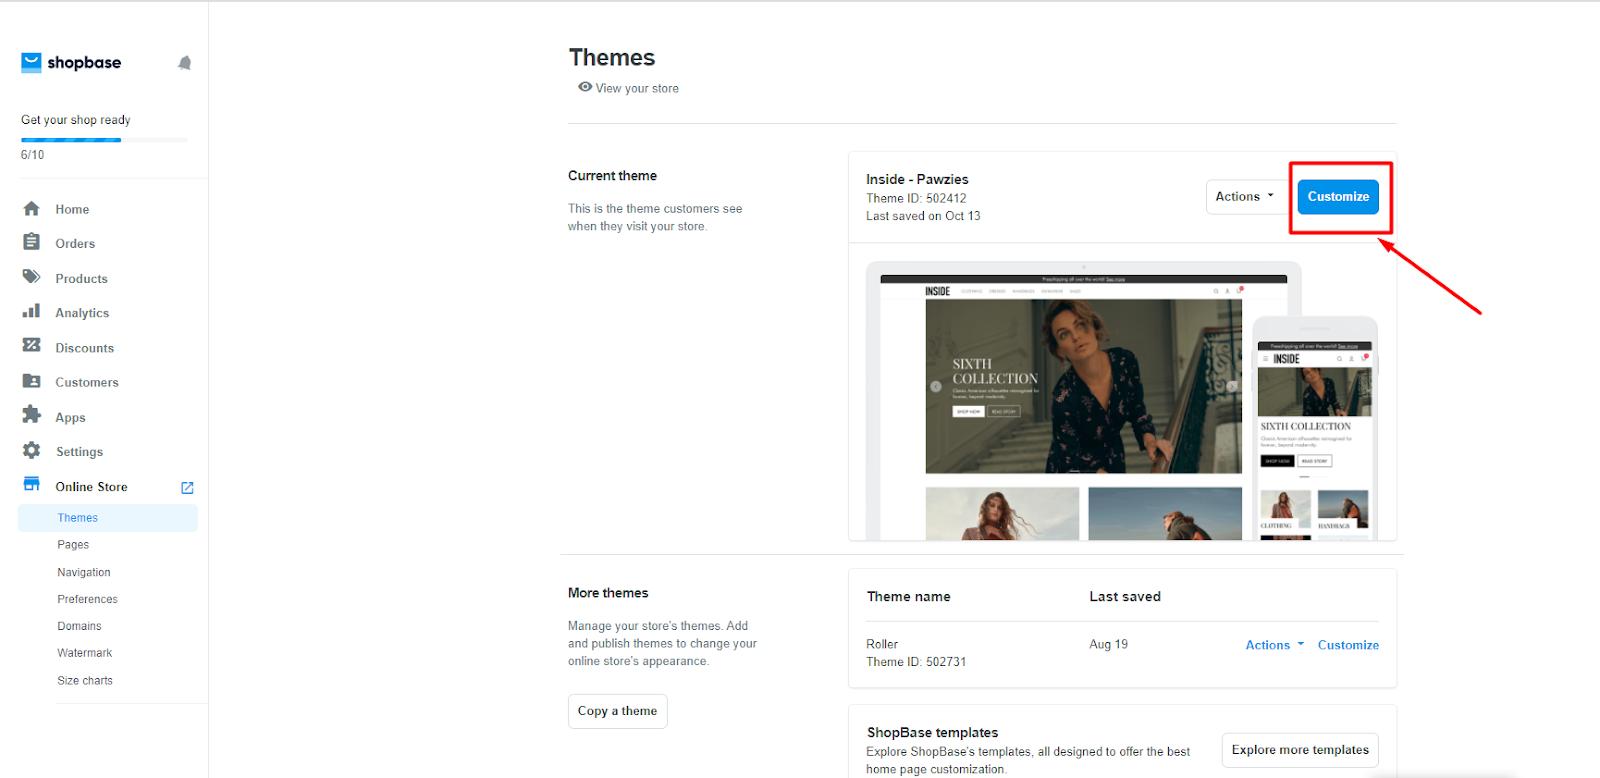 https://www.shopbase.com/?utm_source=communityus&utm_medium=blog&utm_campaign=ecommercewebsite